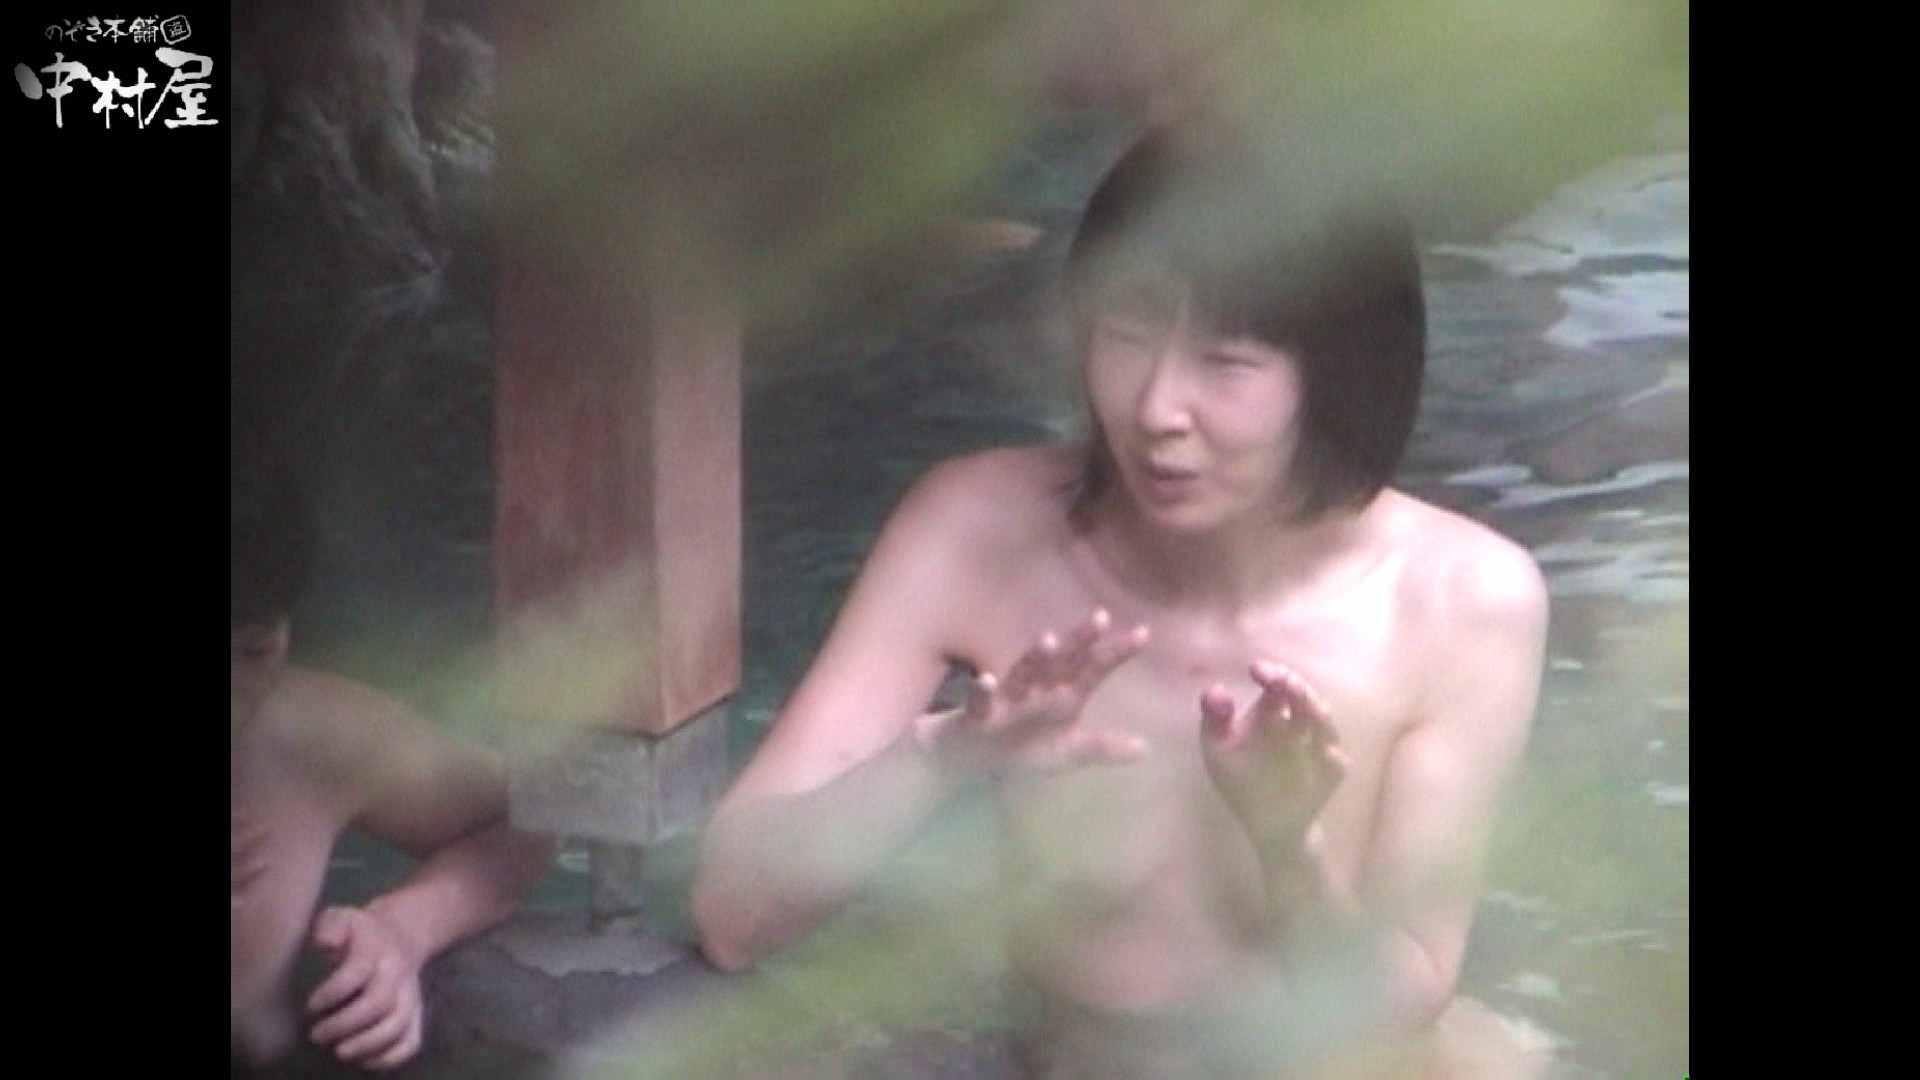 Aquaな露天風呂Vol.953 盗撮師作品  70pic 6